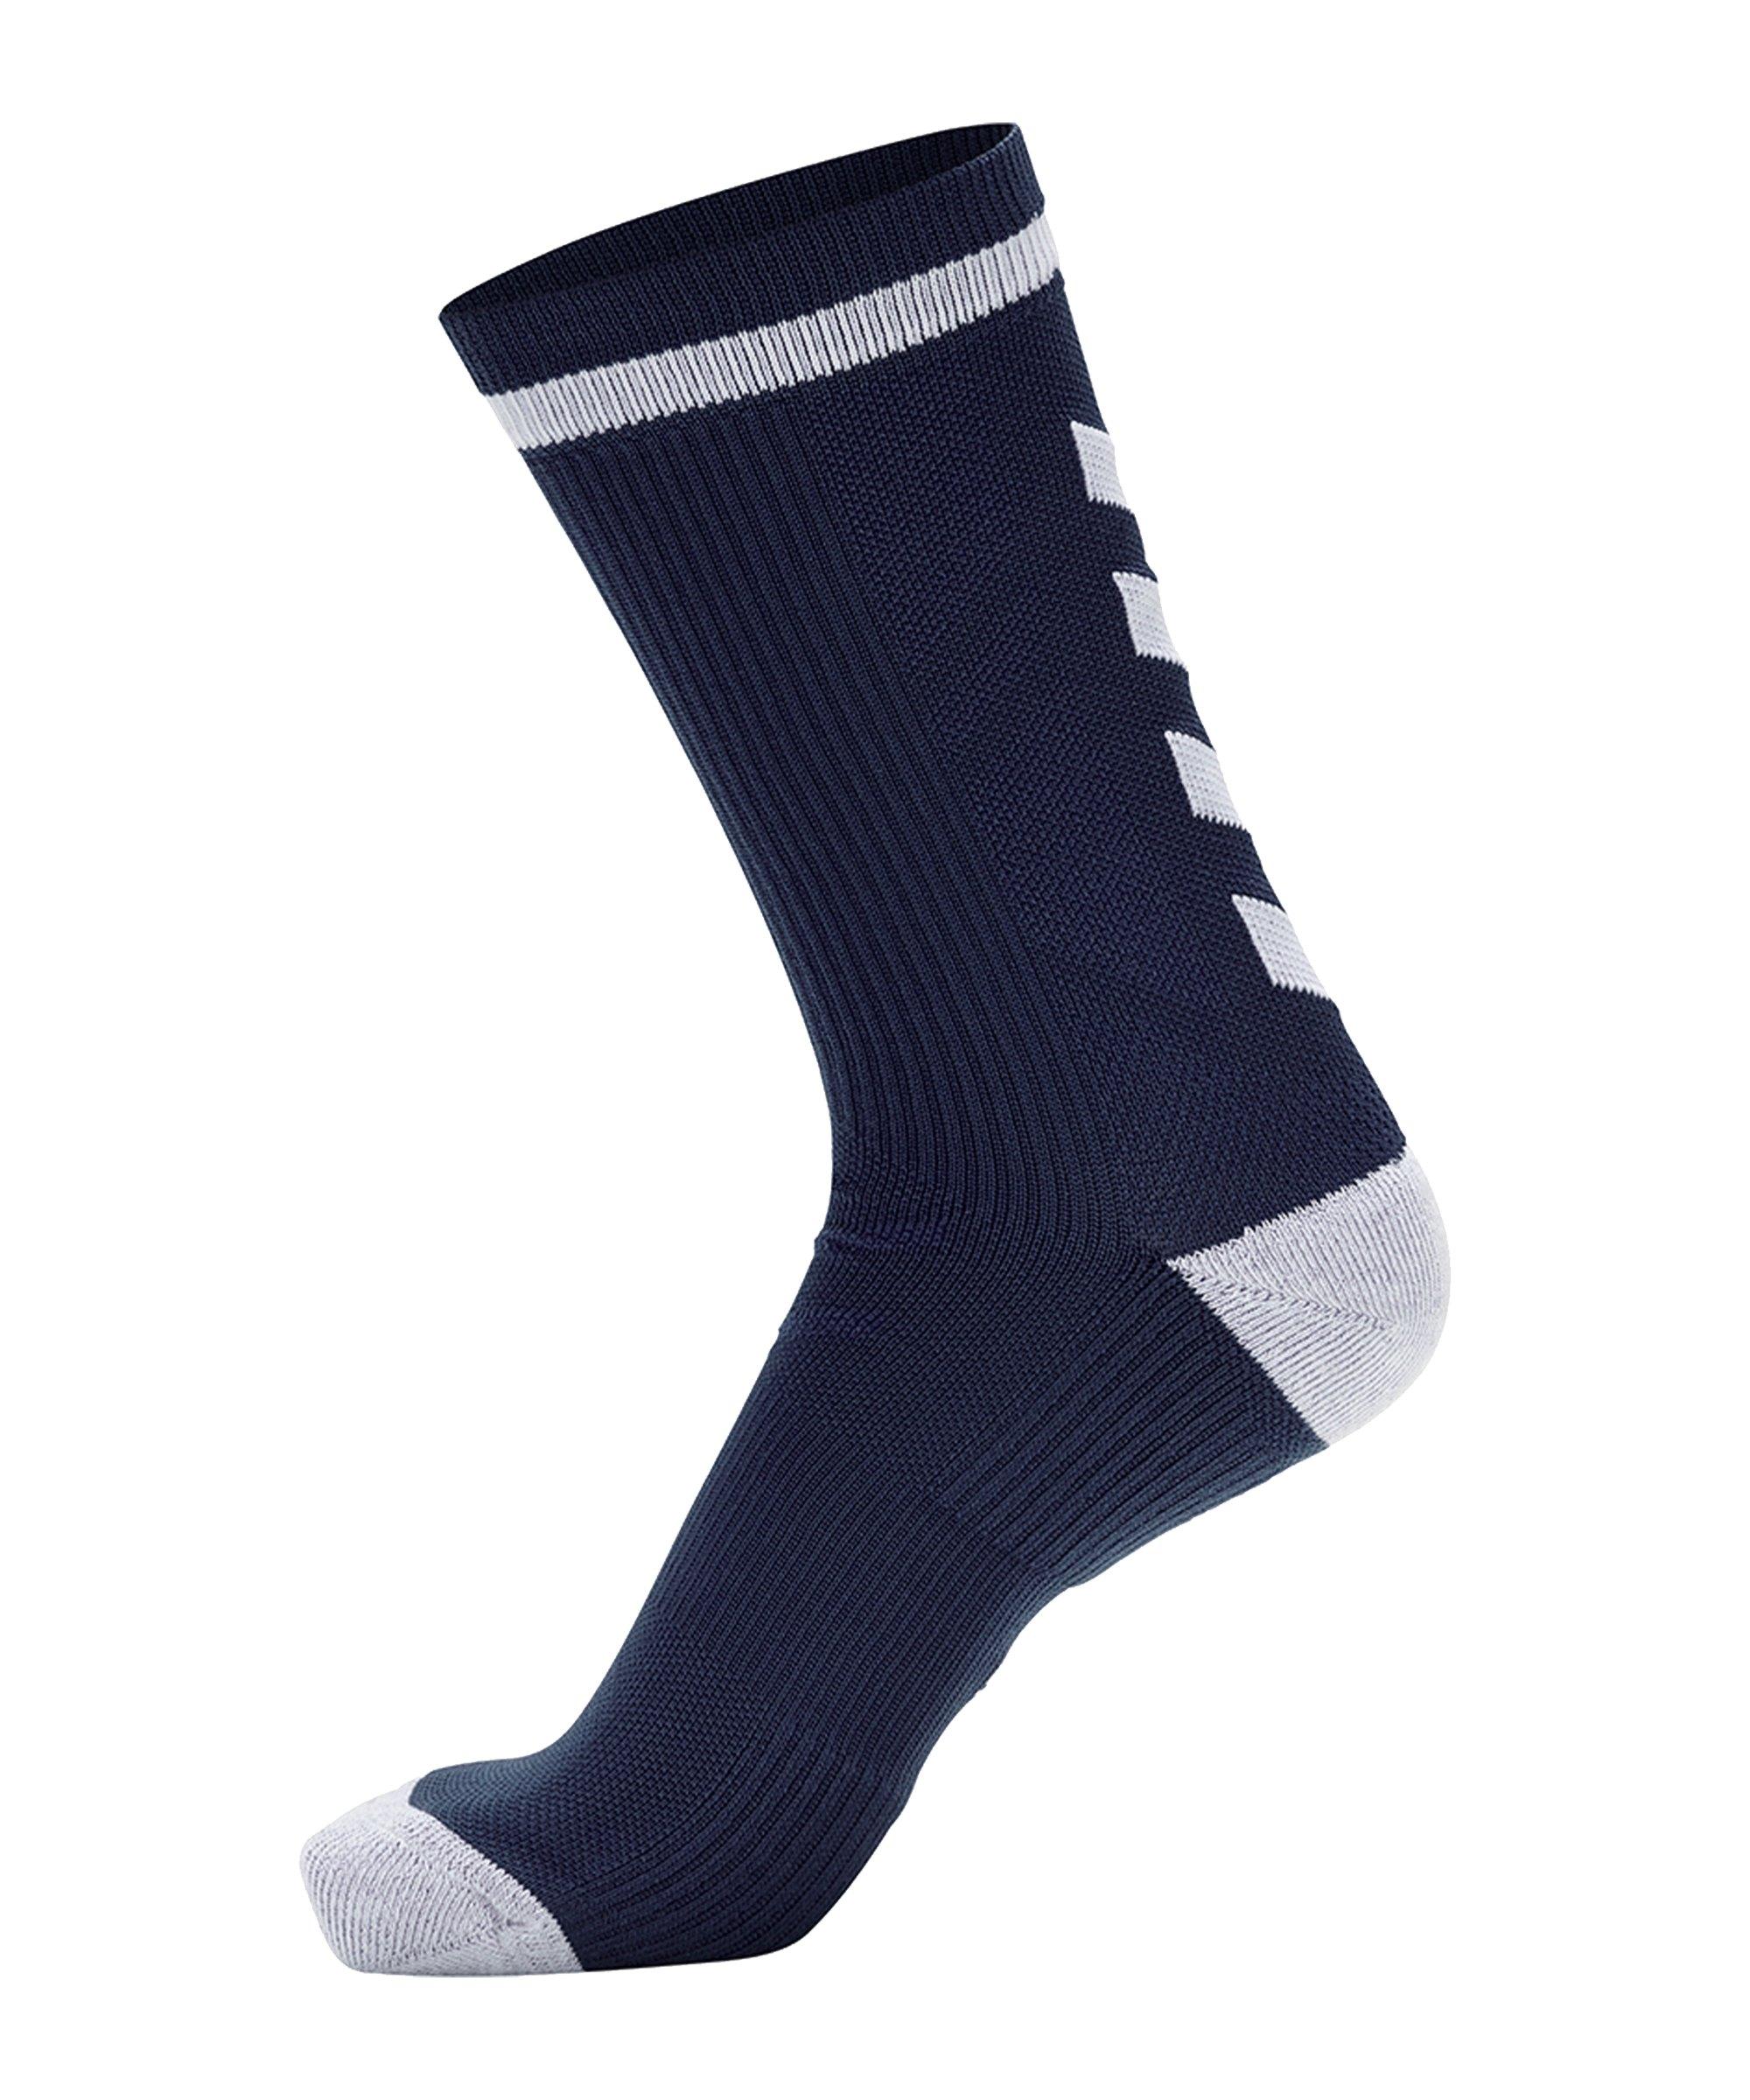 Hummel Elite Indoor Sock Low Socken Blau F7172 - blau